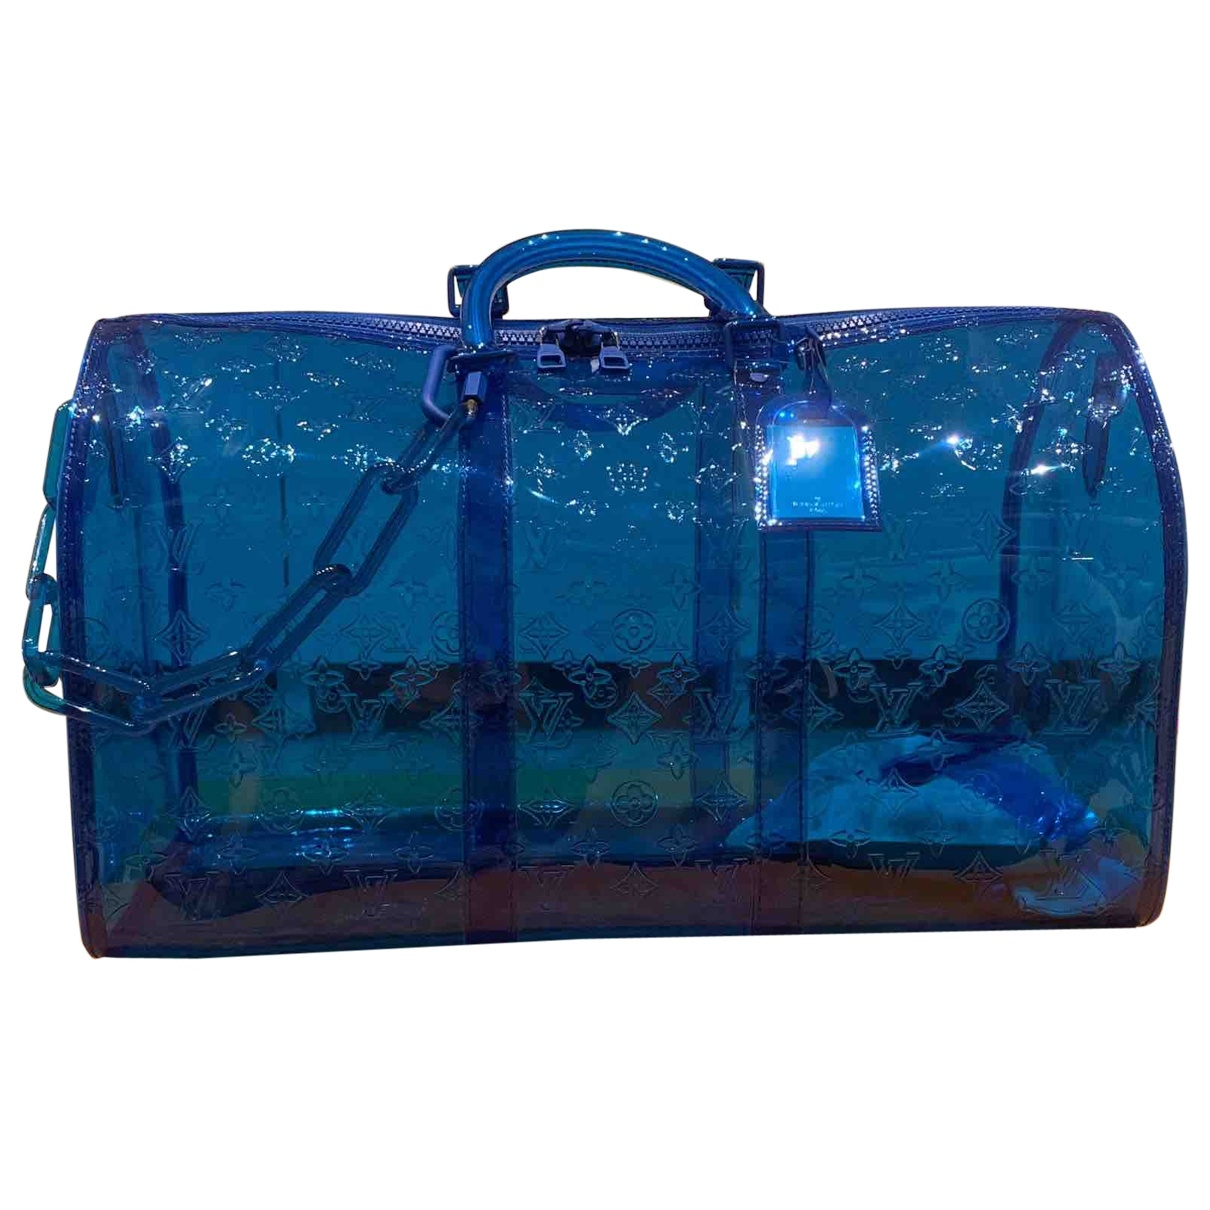 Louis Vuitton Keepall Prism Blue bag for Men \N